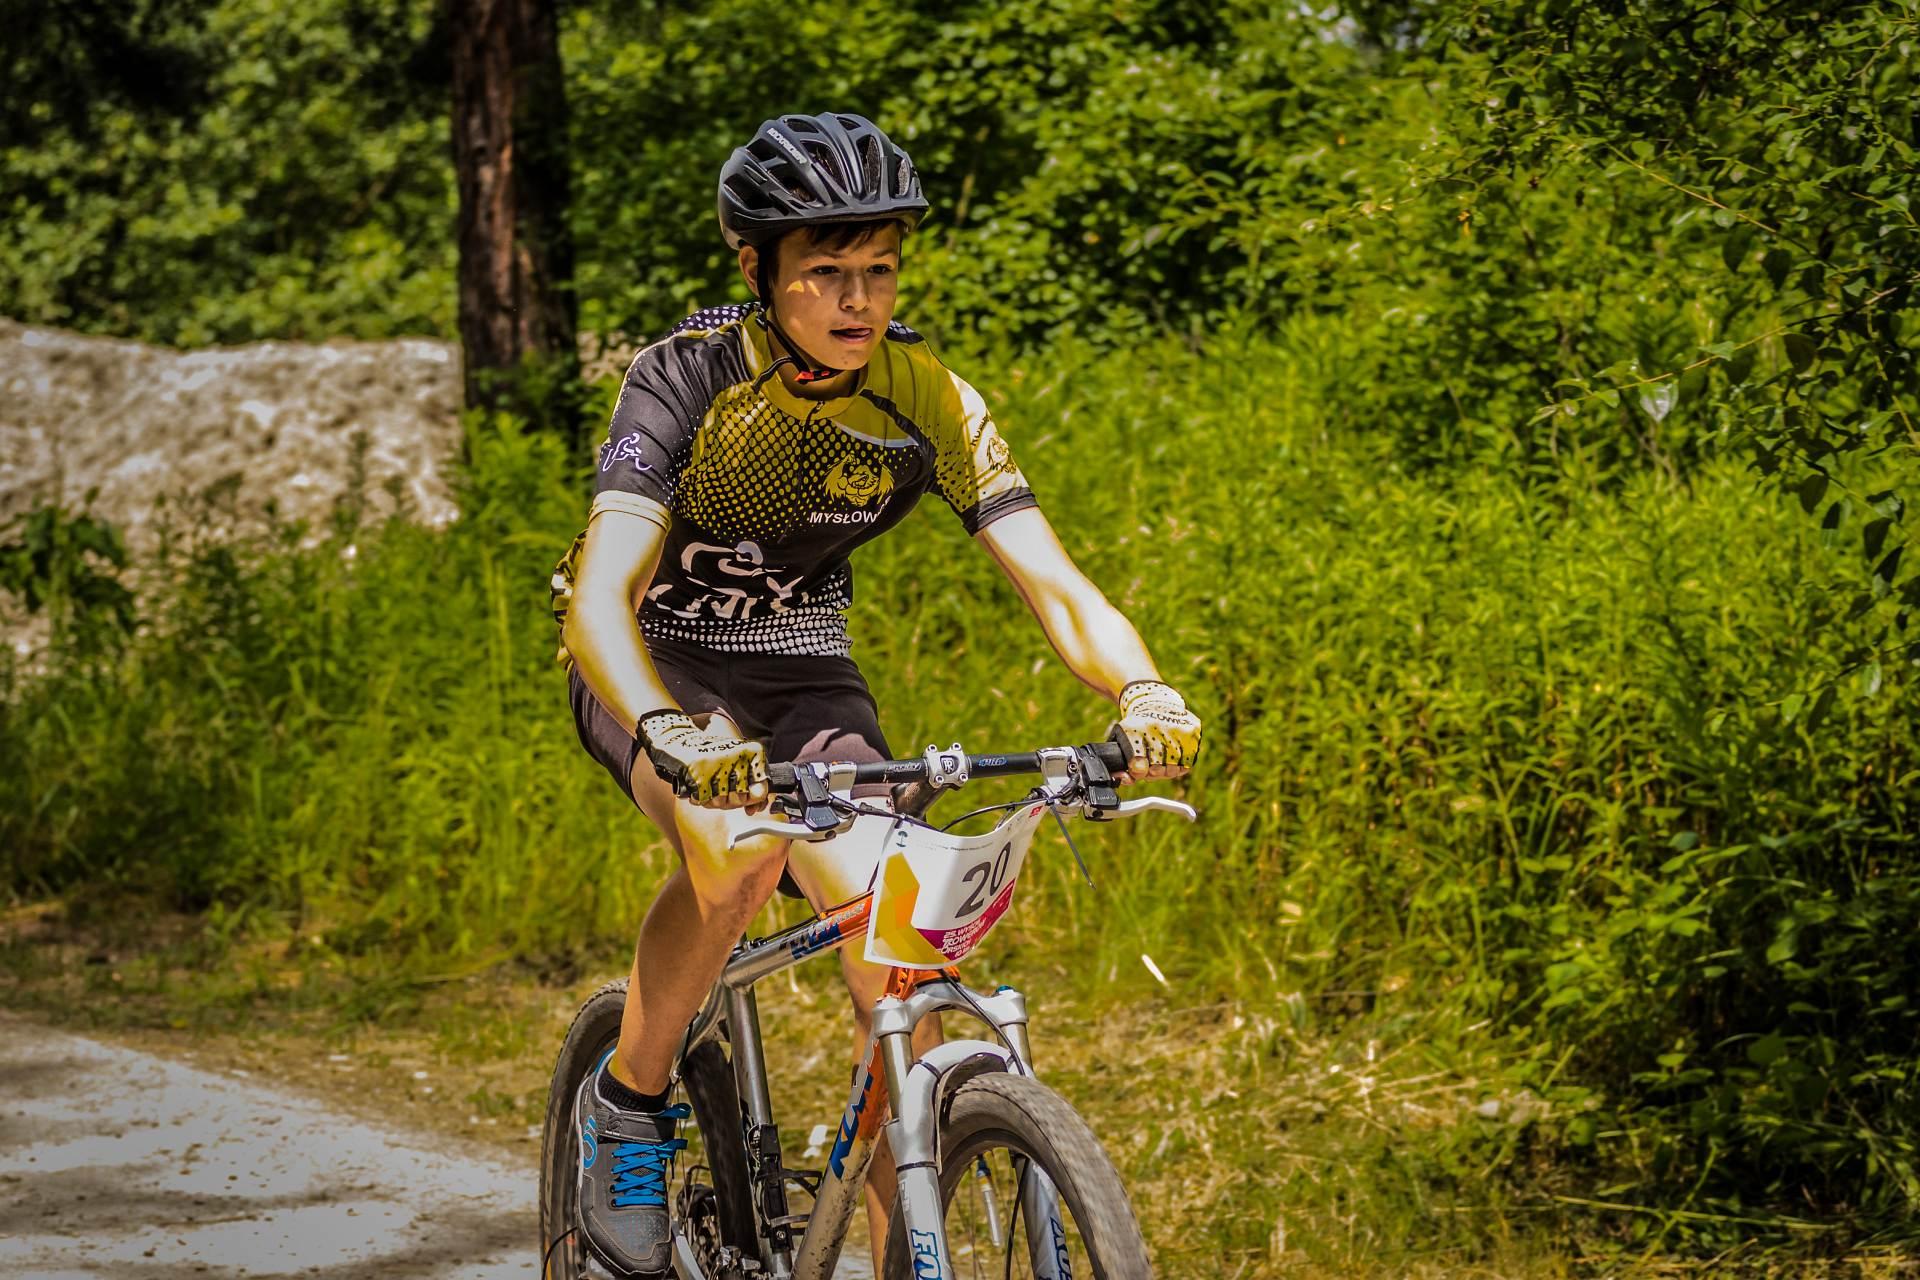 wyscig-rowerow-gorskich-0118